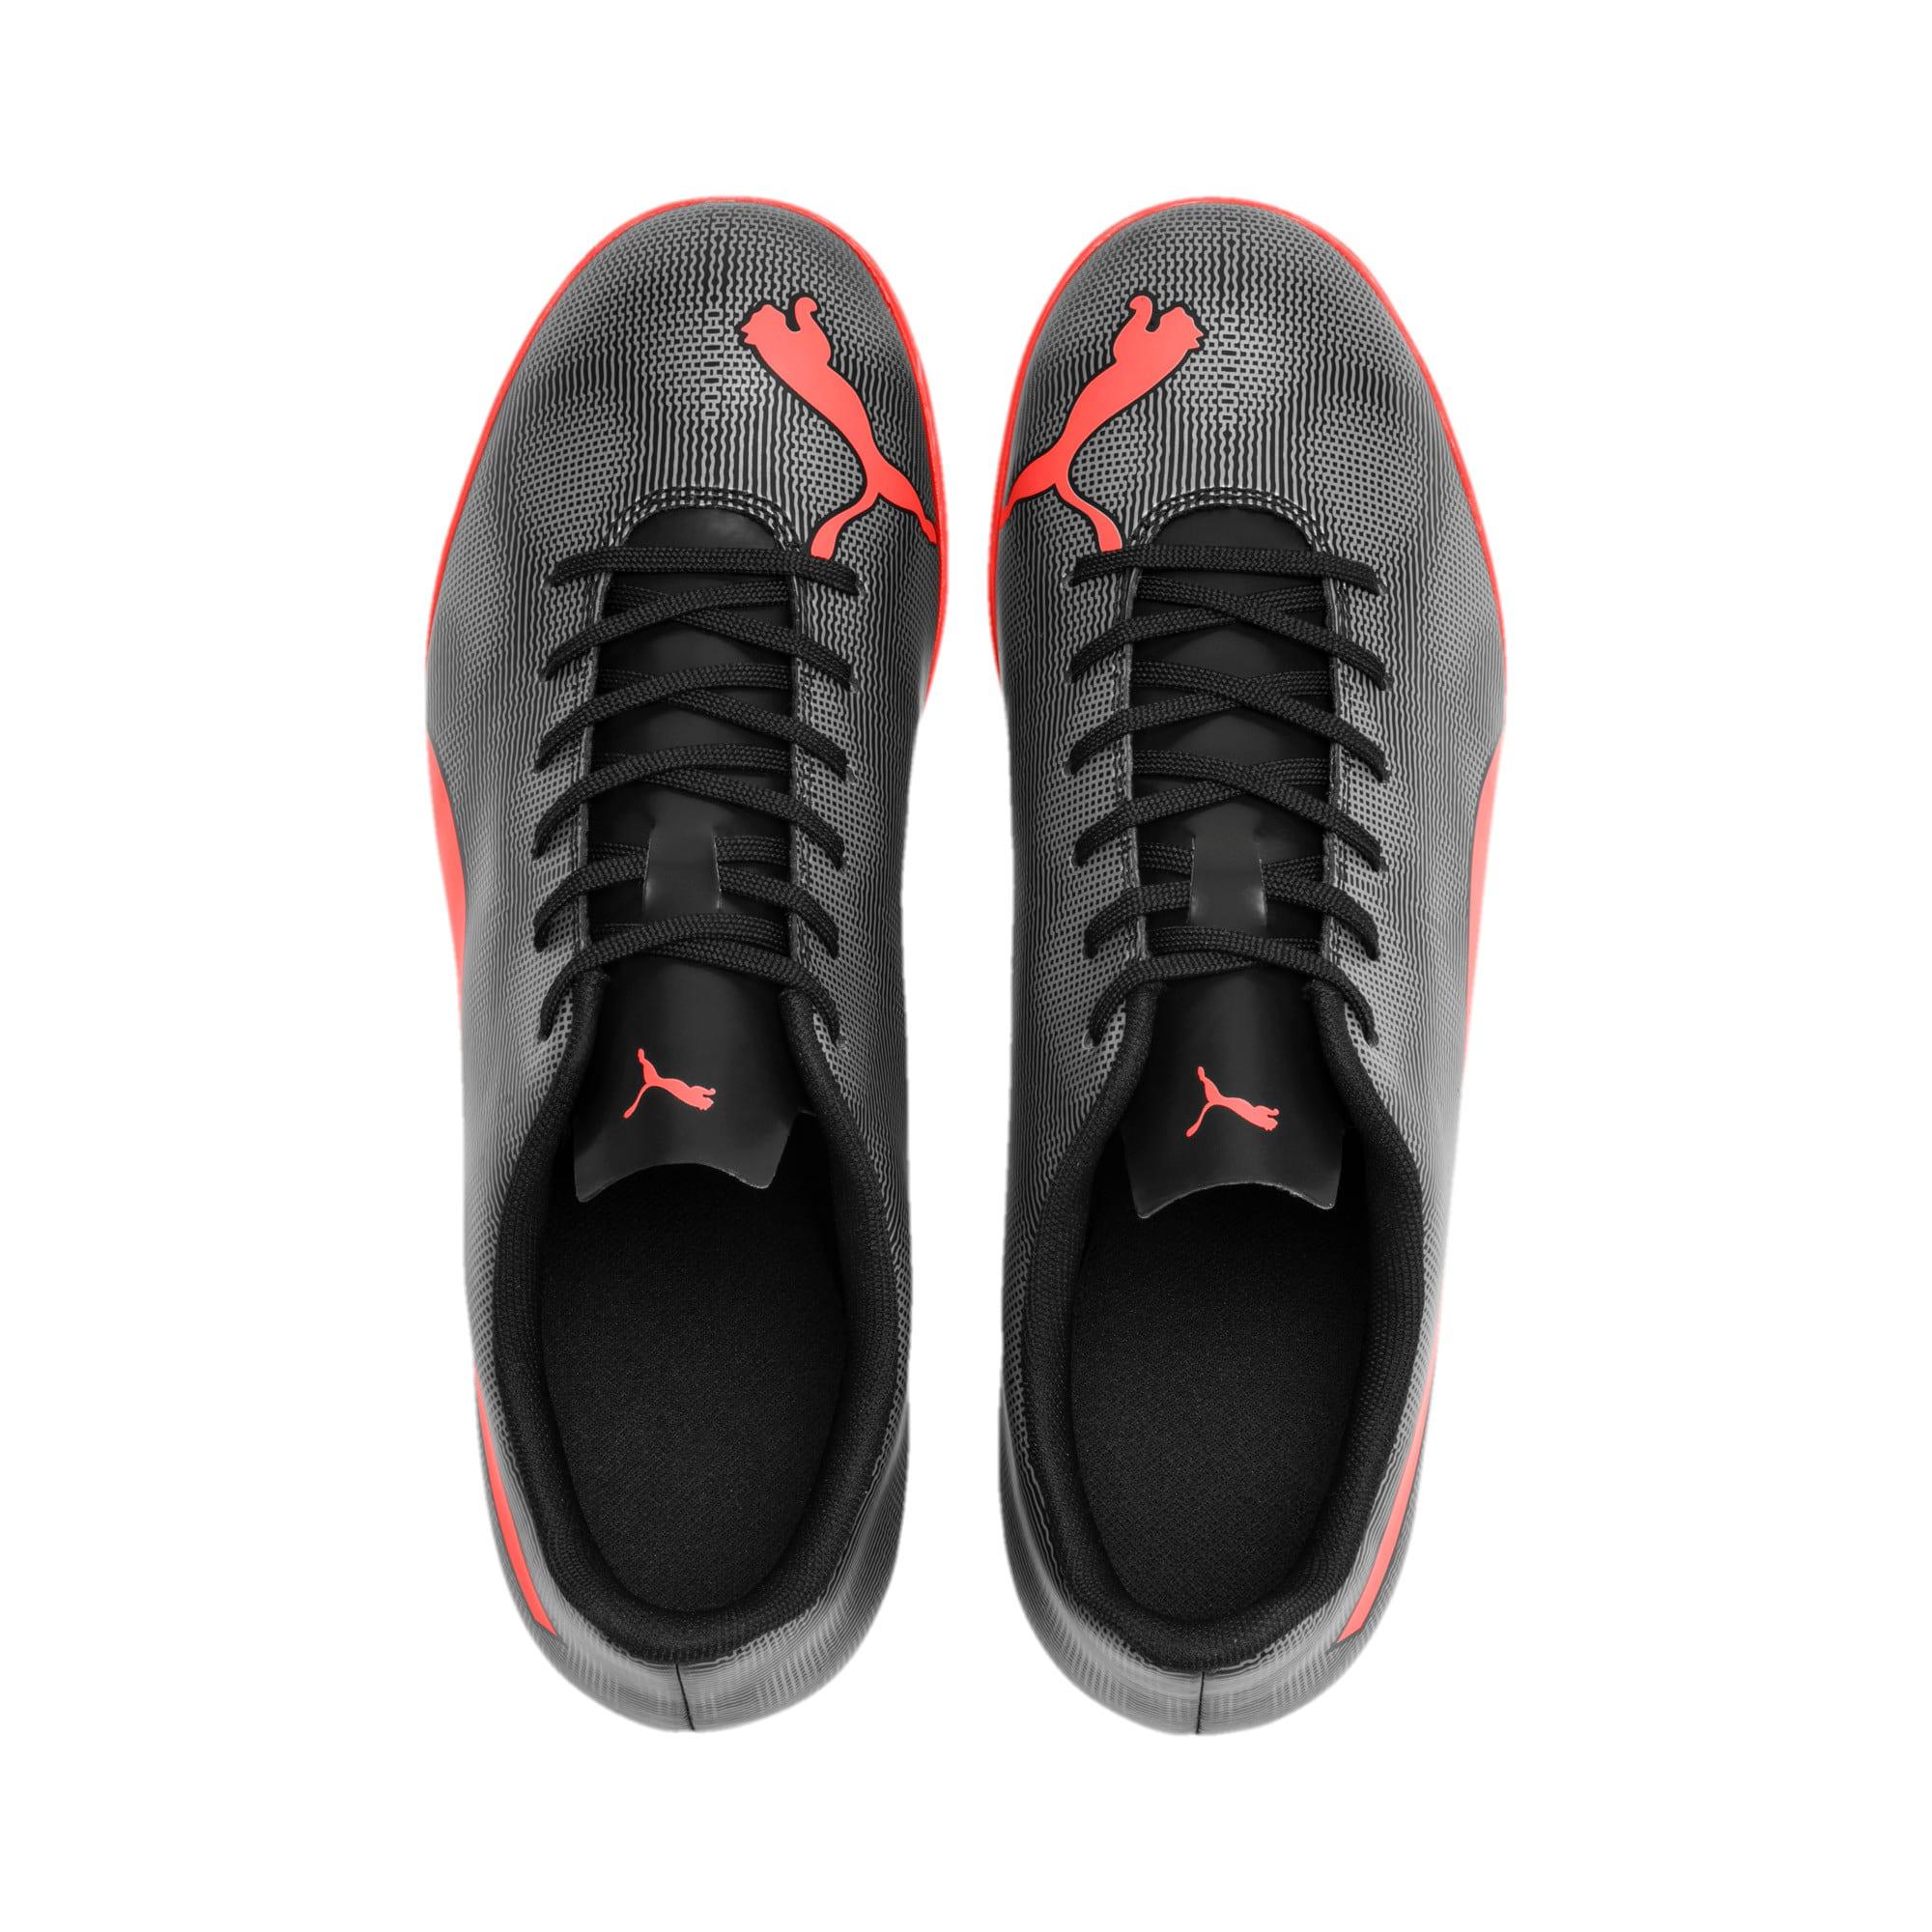 Thumbnail 7 of Rapido TT Men's Soccer Cleats, Black-Nrgy Red-Aged Silver, medium